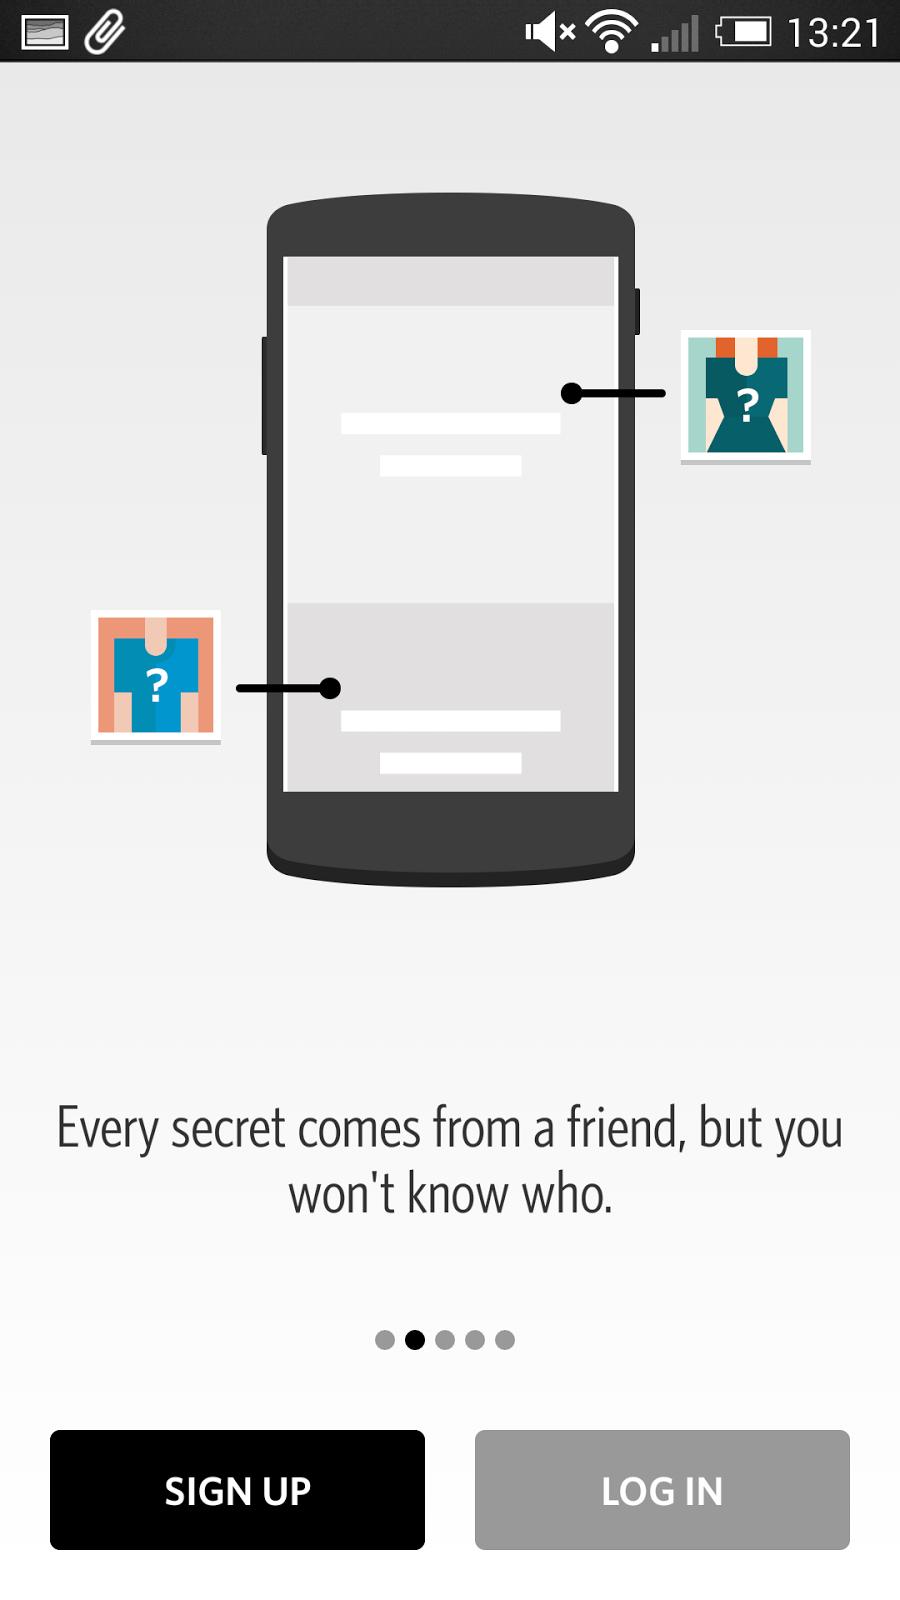 Secret 解除分享焦慮的社交 App ,對朋友匿名寫真心話 secret-01